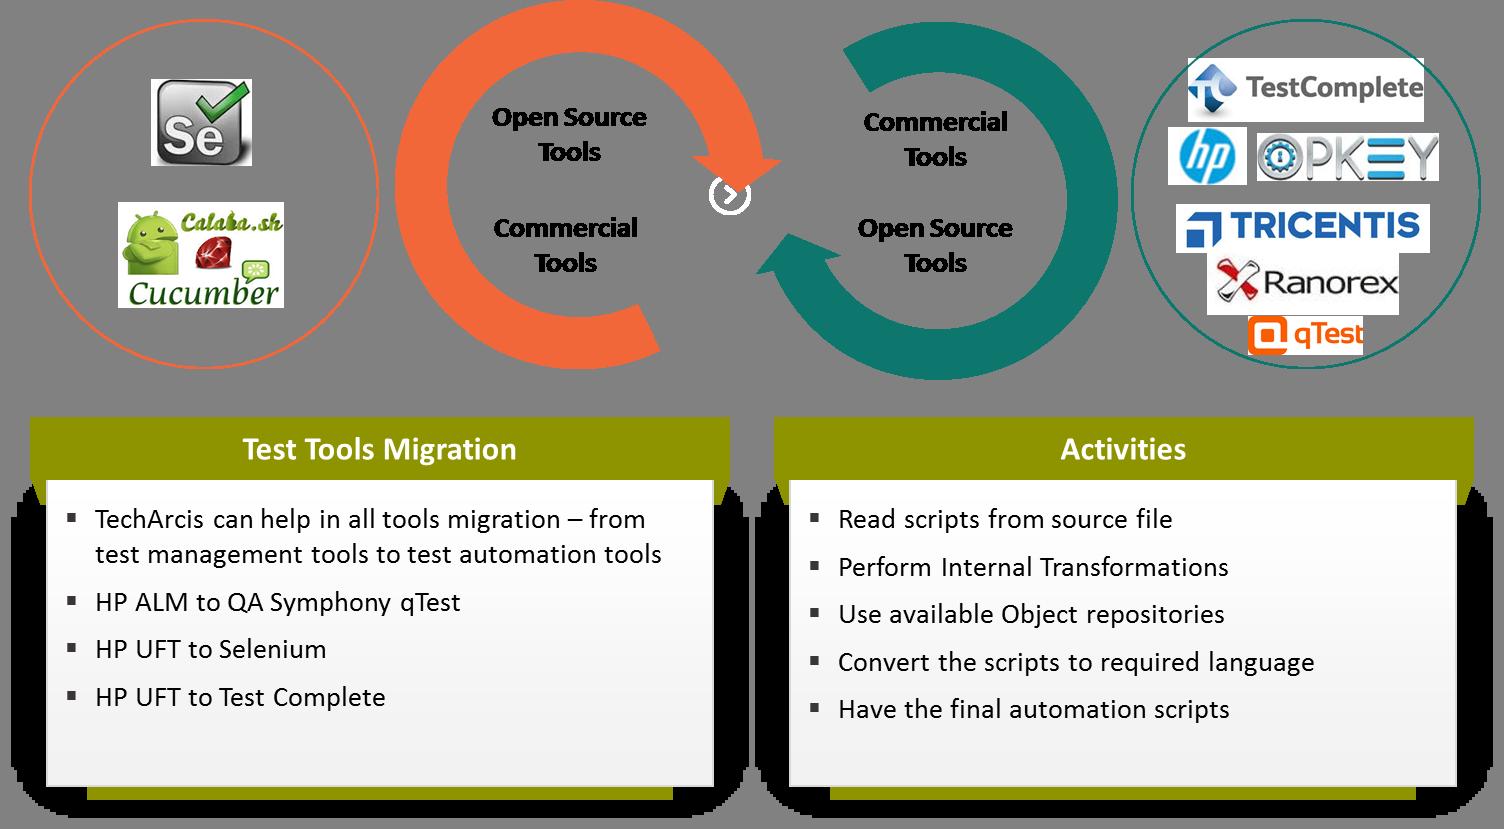 Test Tools Migration - TechArcis Solutions